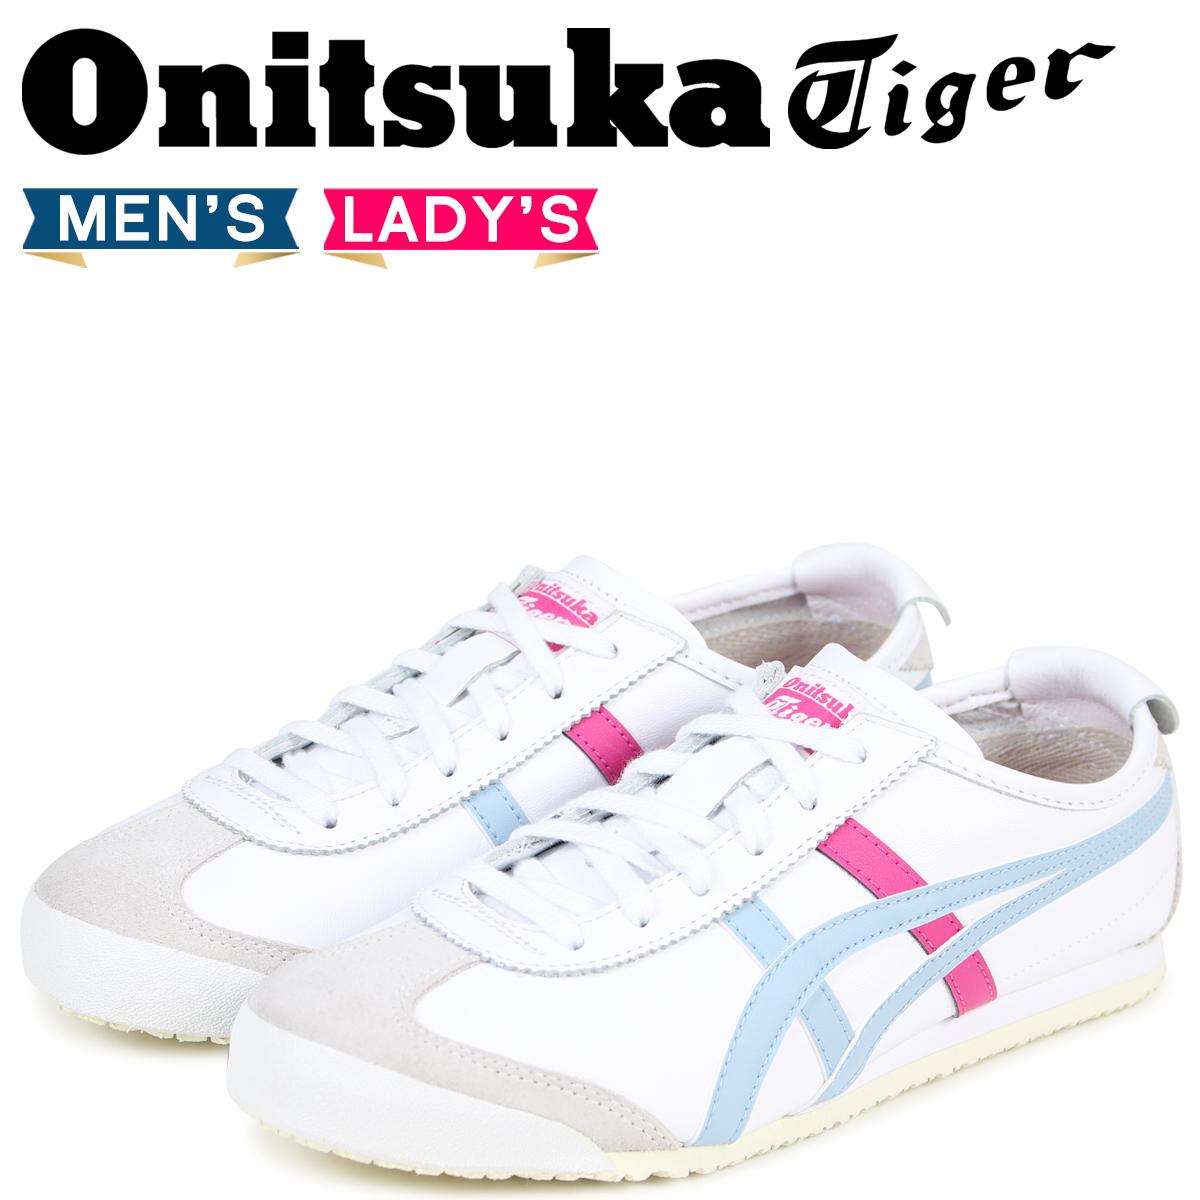 aafd85ce42 Onitsuka Tiger Mexico 66 Onitsuka tiger MEXICO 66 men's lady's sneakers  D4J2L-0140 TH4J2L- ...